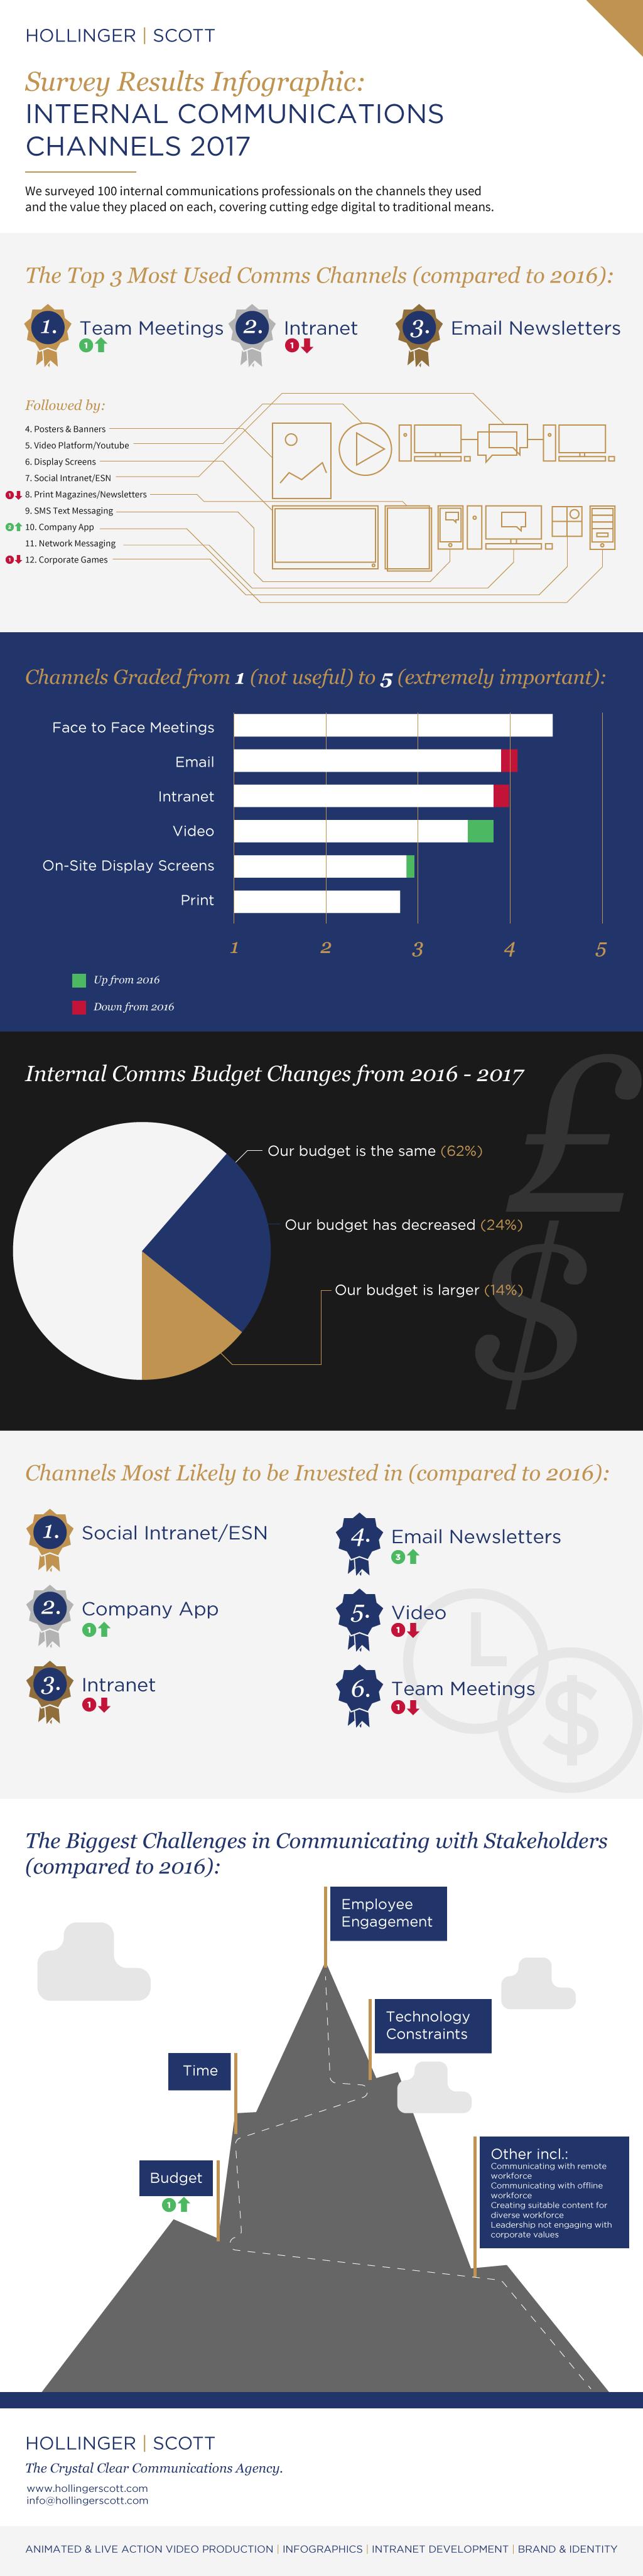 Internal Communications Survey 2017